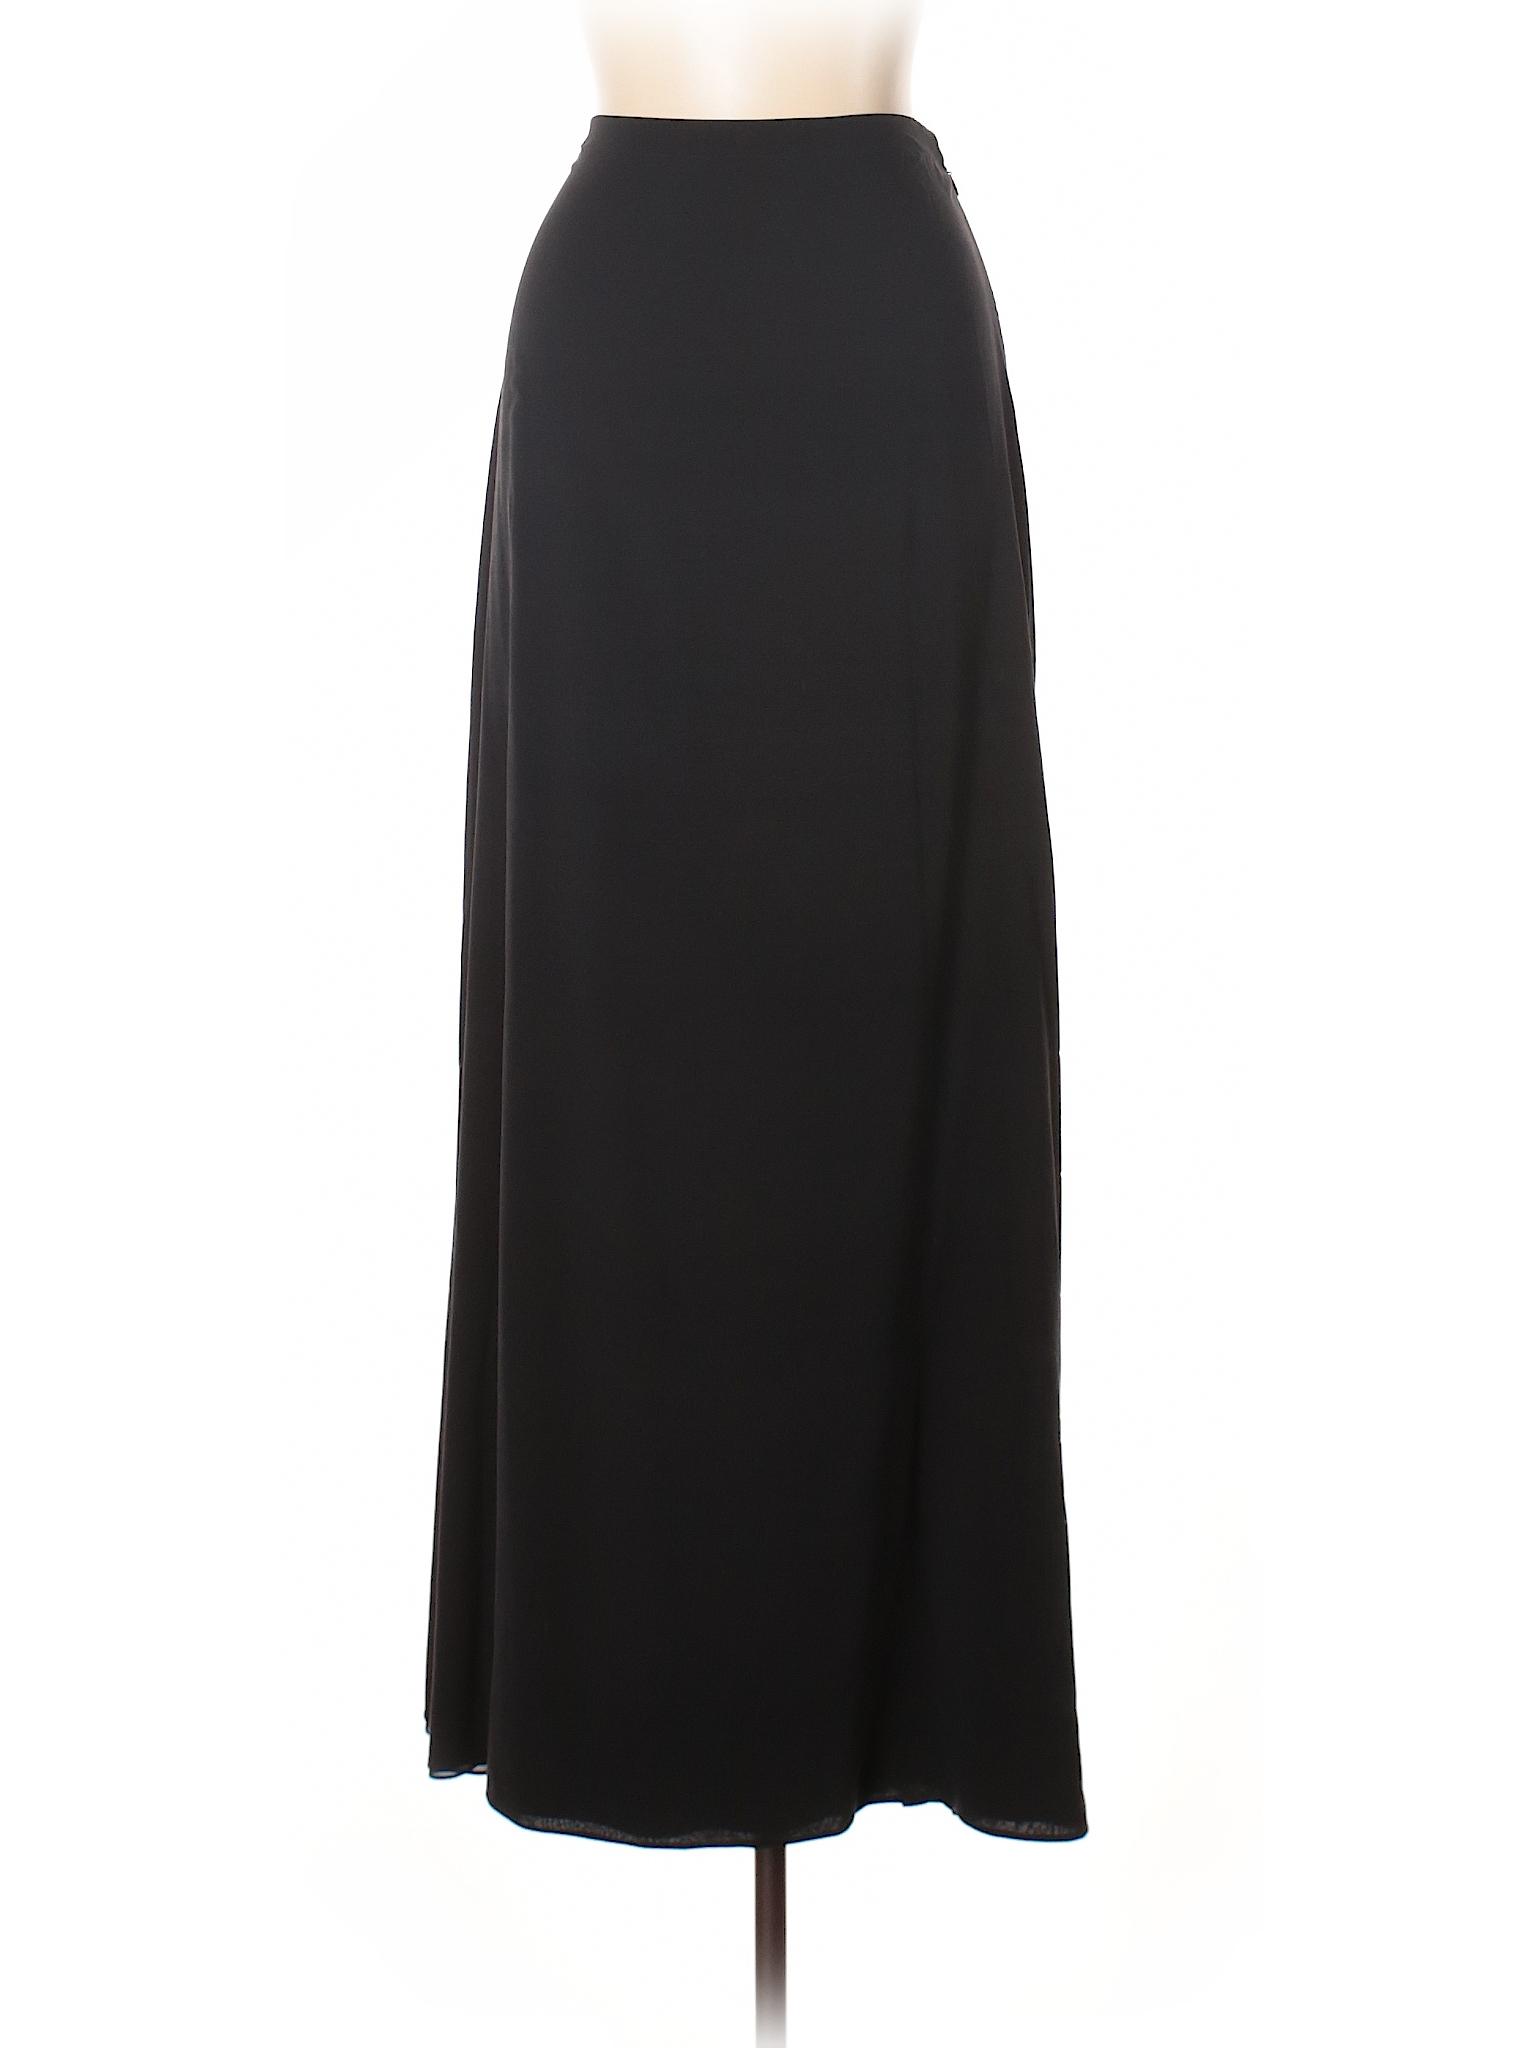 Skirt St Casual Leisure Boutique John x1pqfcwFB